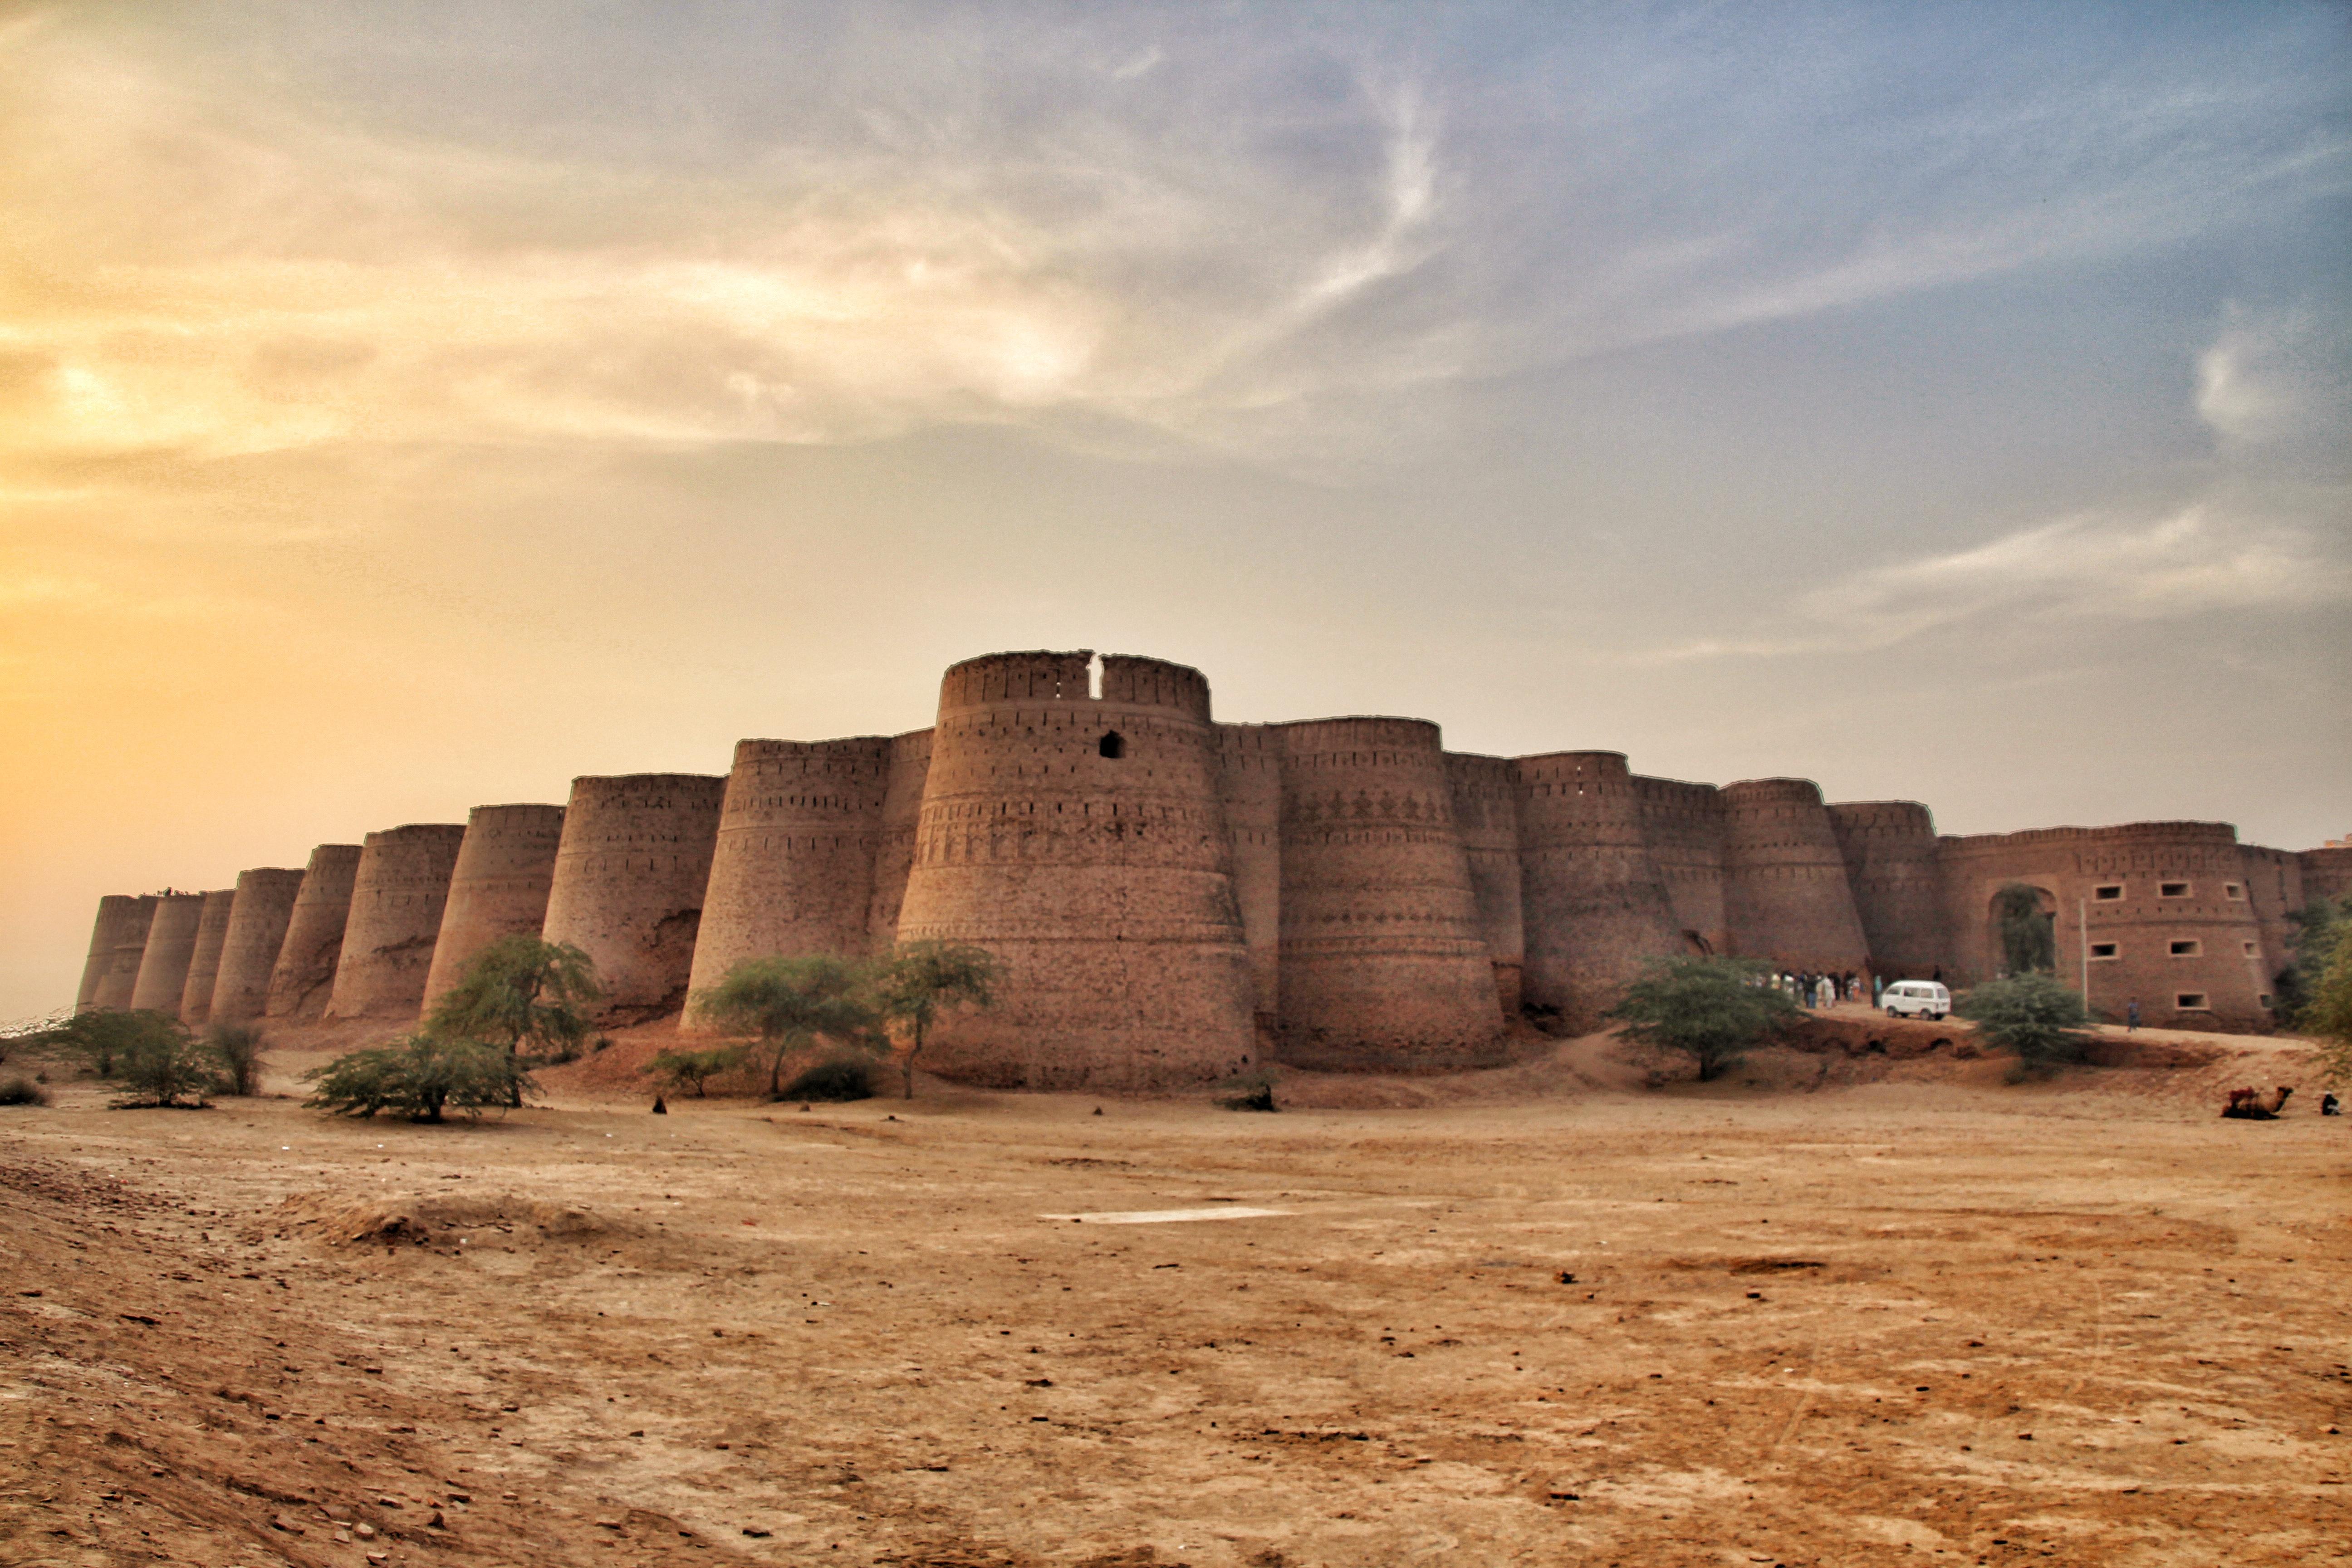 Bahawalpur dating site - free online dating in Bahawalpur (Pakistan)